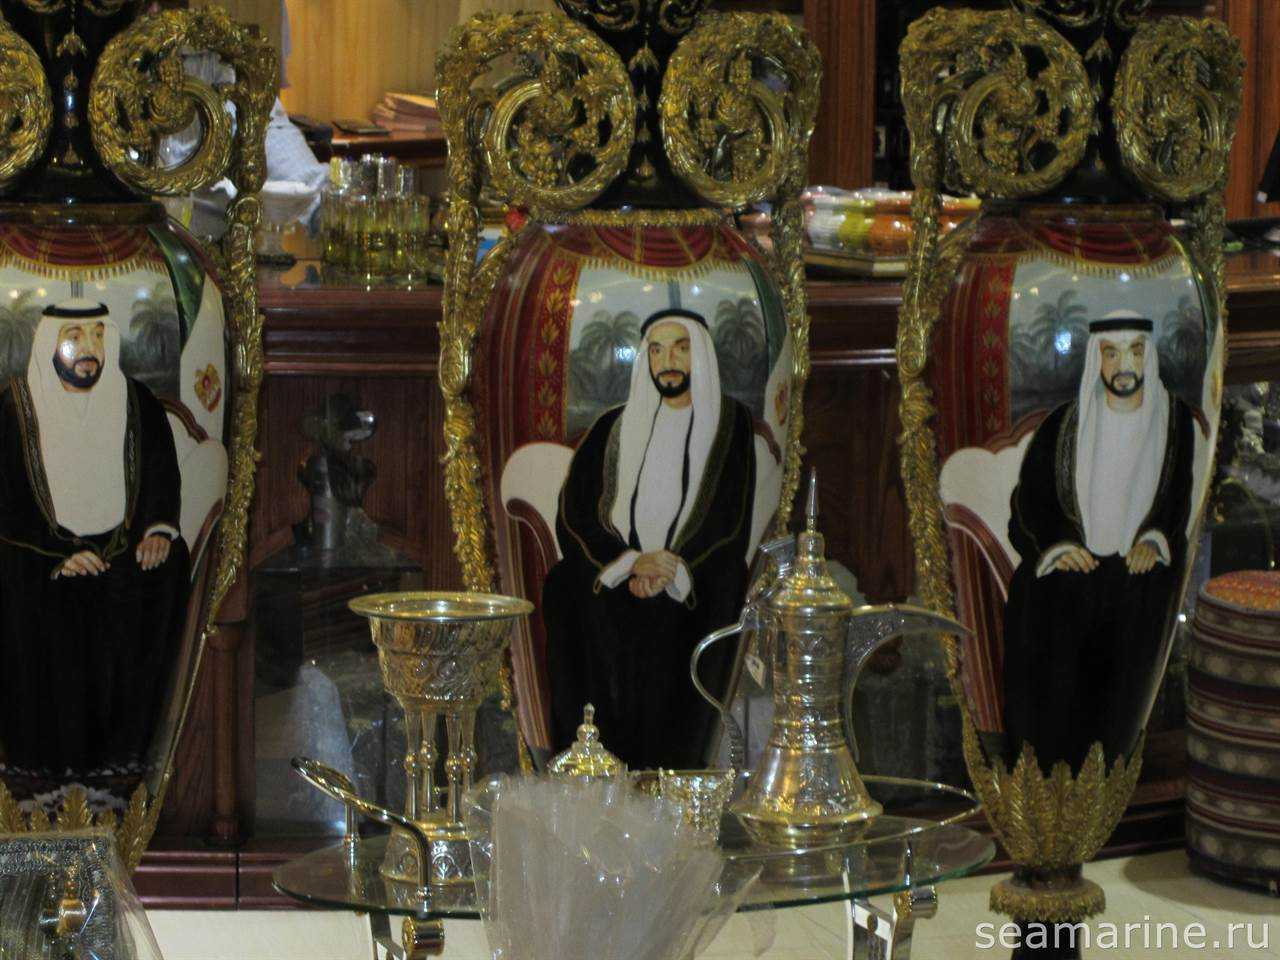 The Souk at Qaryat Al Beri. Abu Dhabi